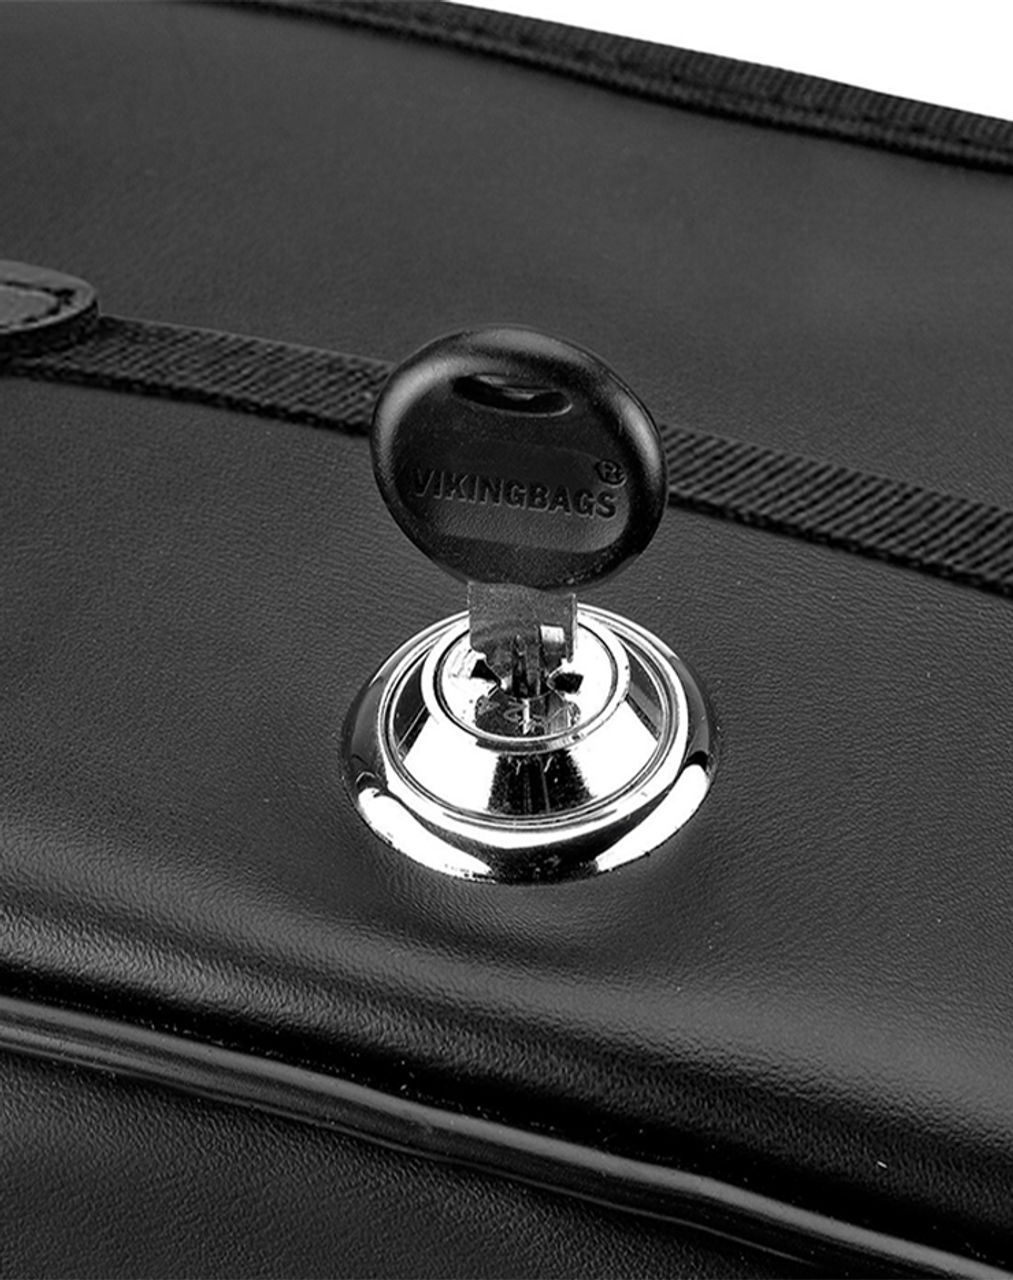 Honda VTX 1300 C Ultimate Extra Large Plain Motorcycle Saddlebags Key lockable View